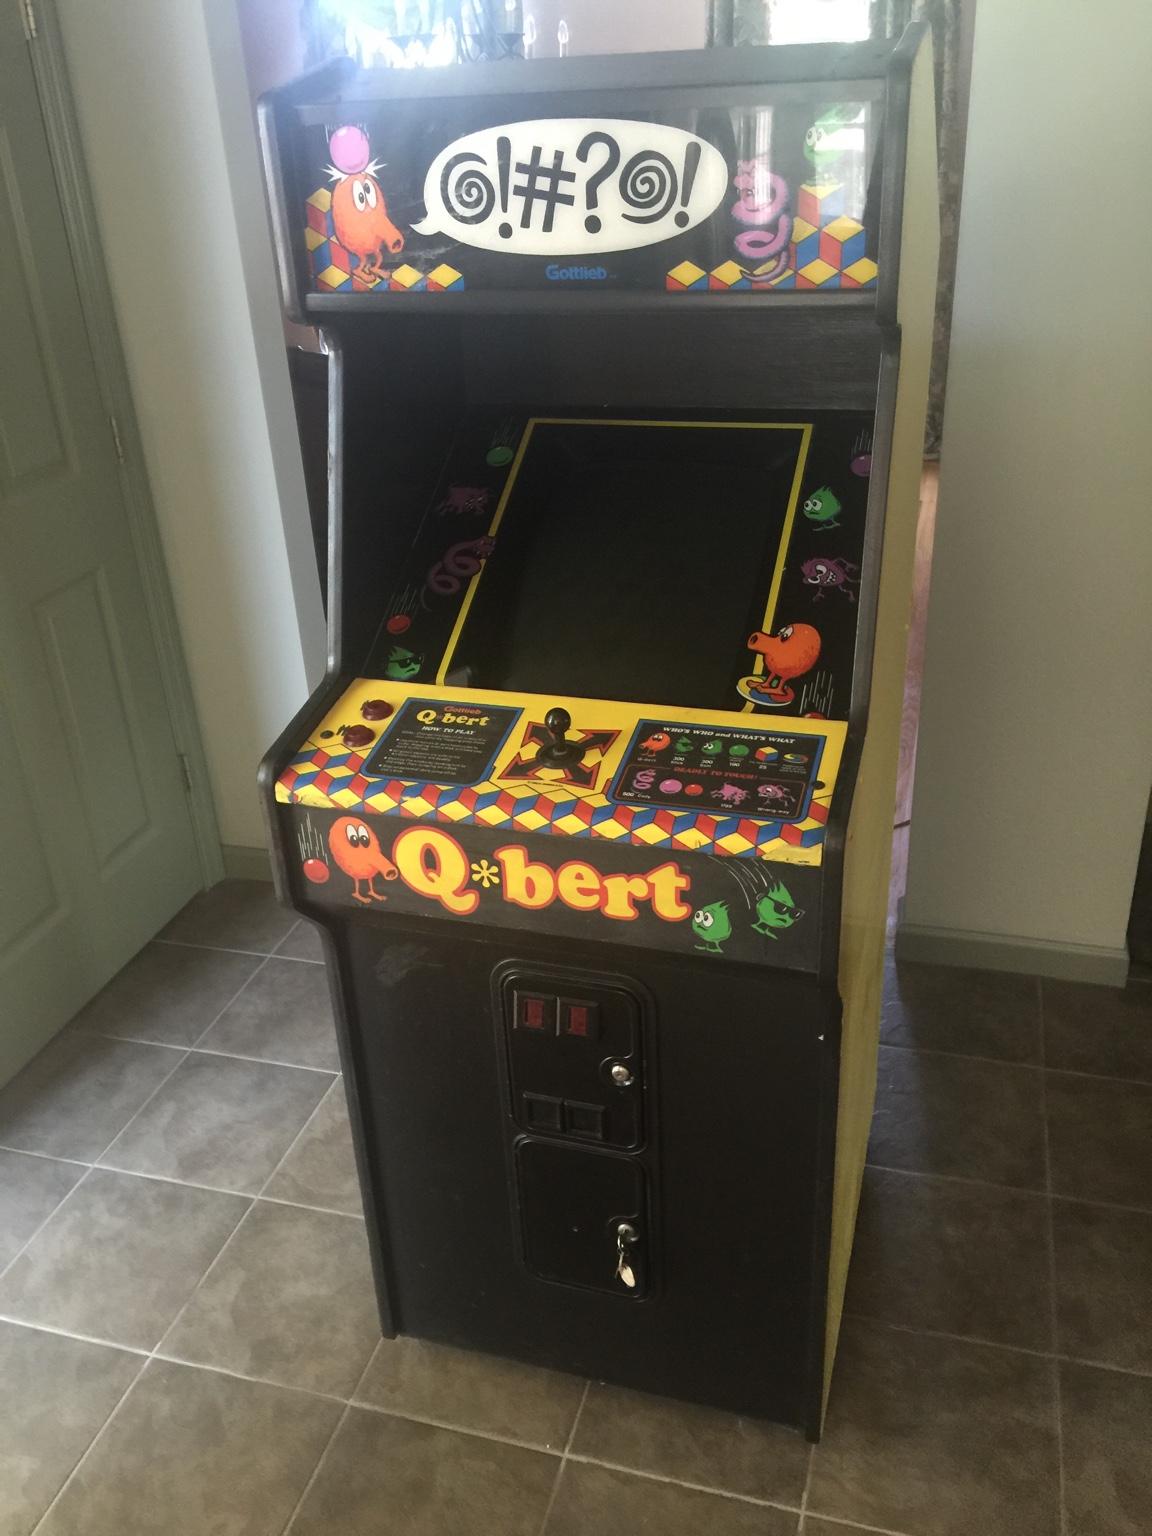 FS Game: Qbert ..... - KLOV/VAPS Coin-op Videogame, Pinball, Slot ...